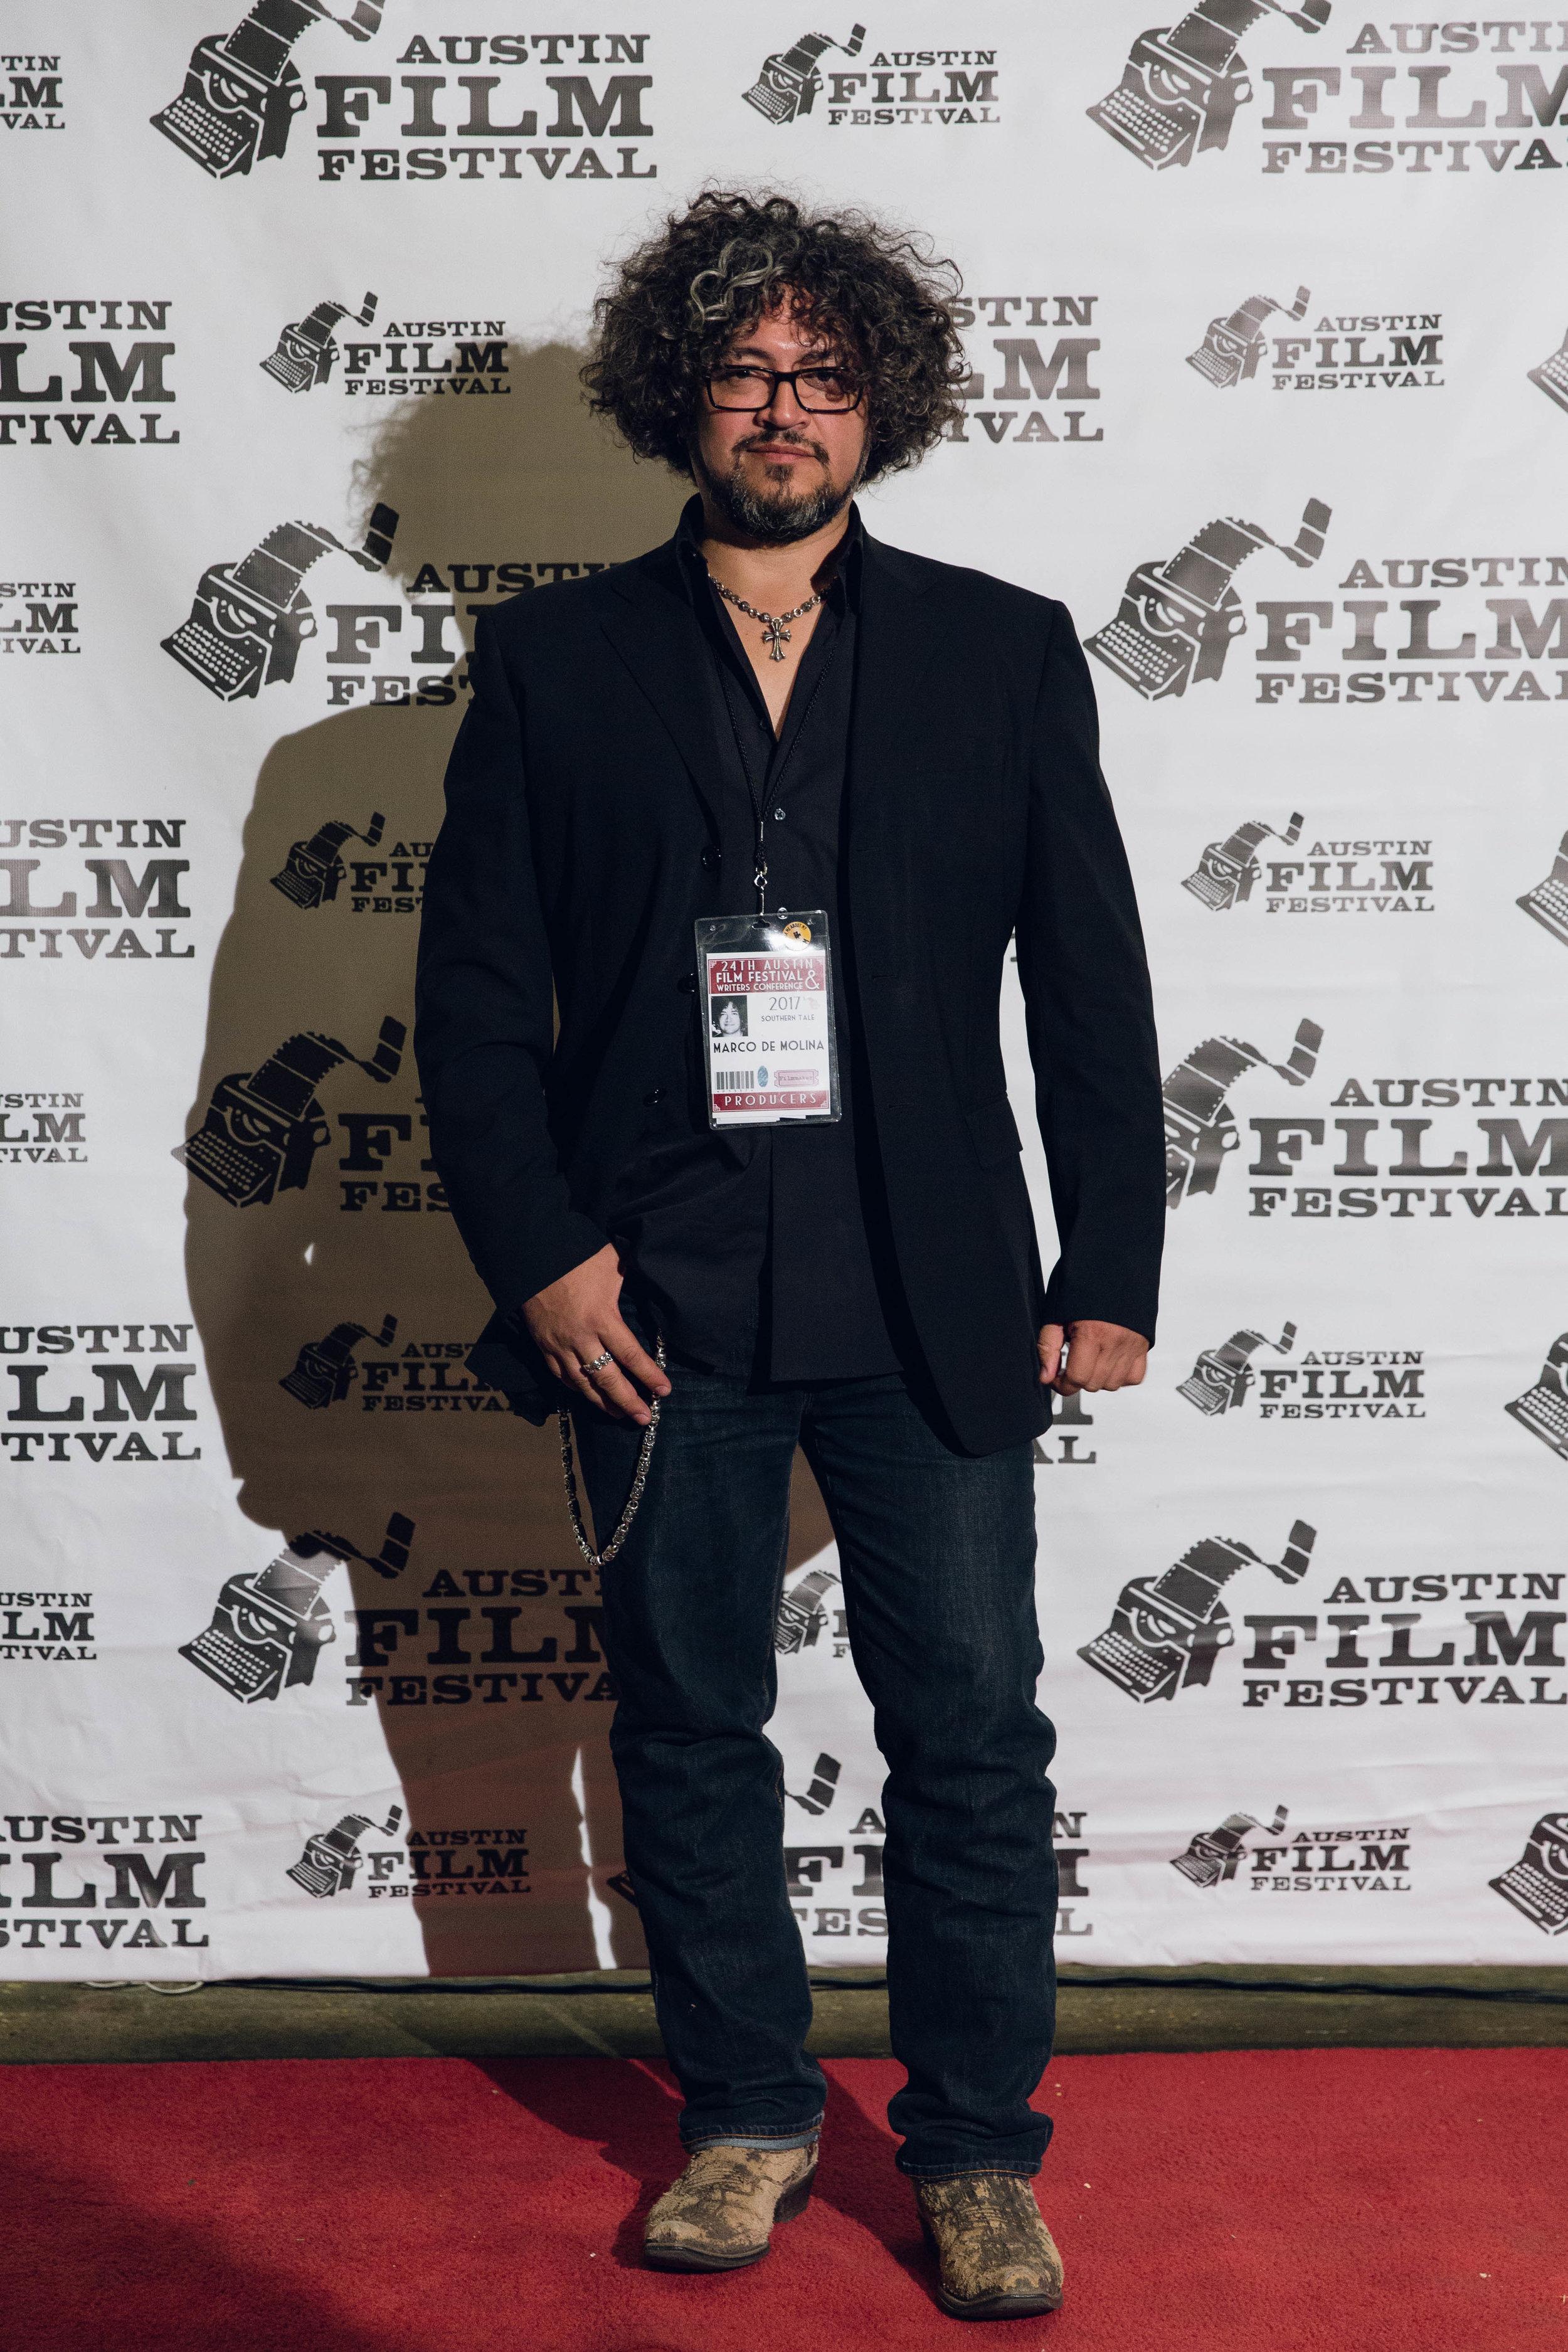 Southern-Tale-Austin-Film-Fest-Kirby-Gladstein-2017-2844.jpg